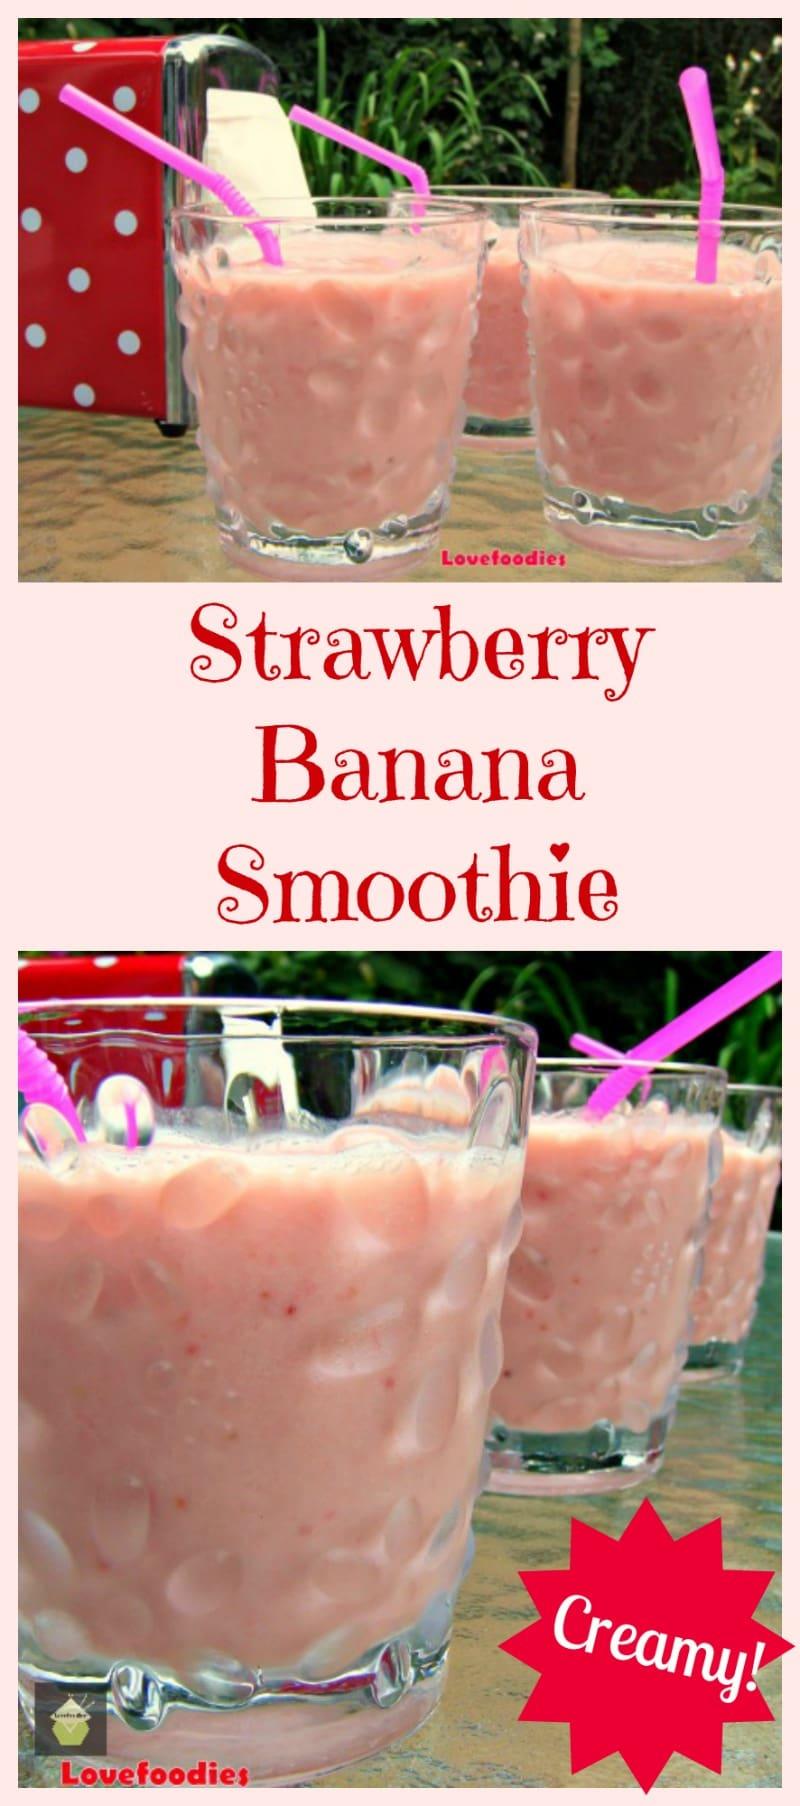 Creamy Banana and Strawberry Smoothie